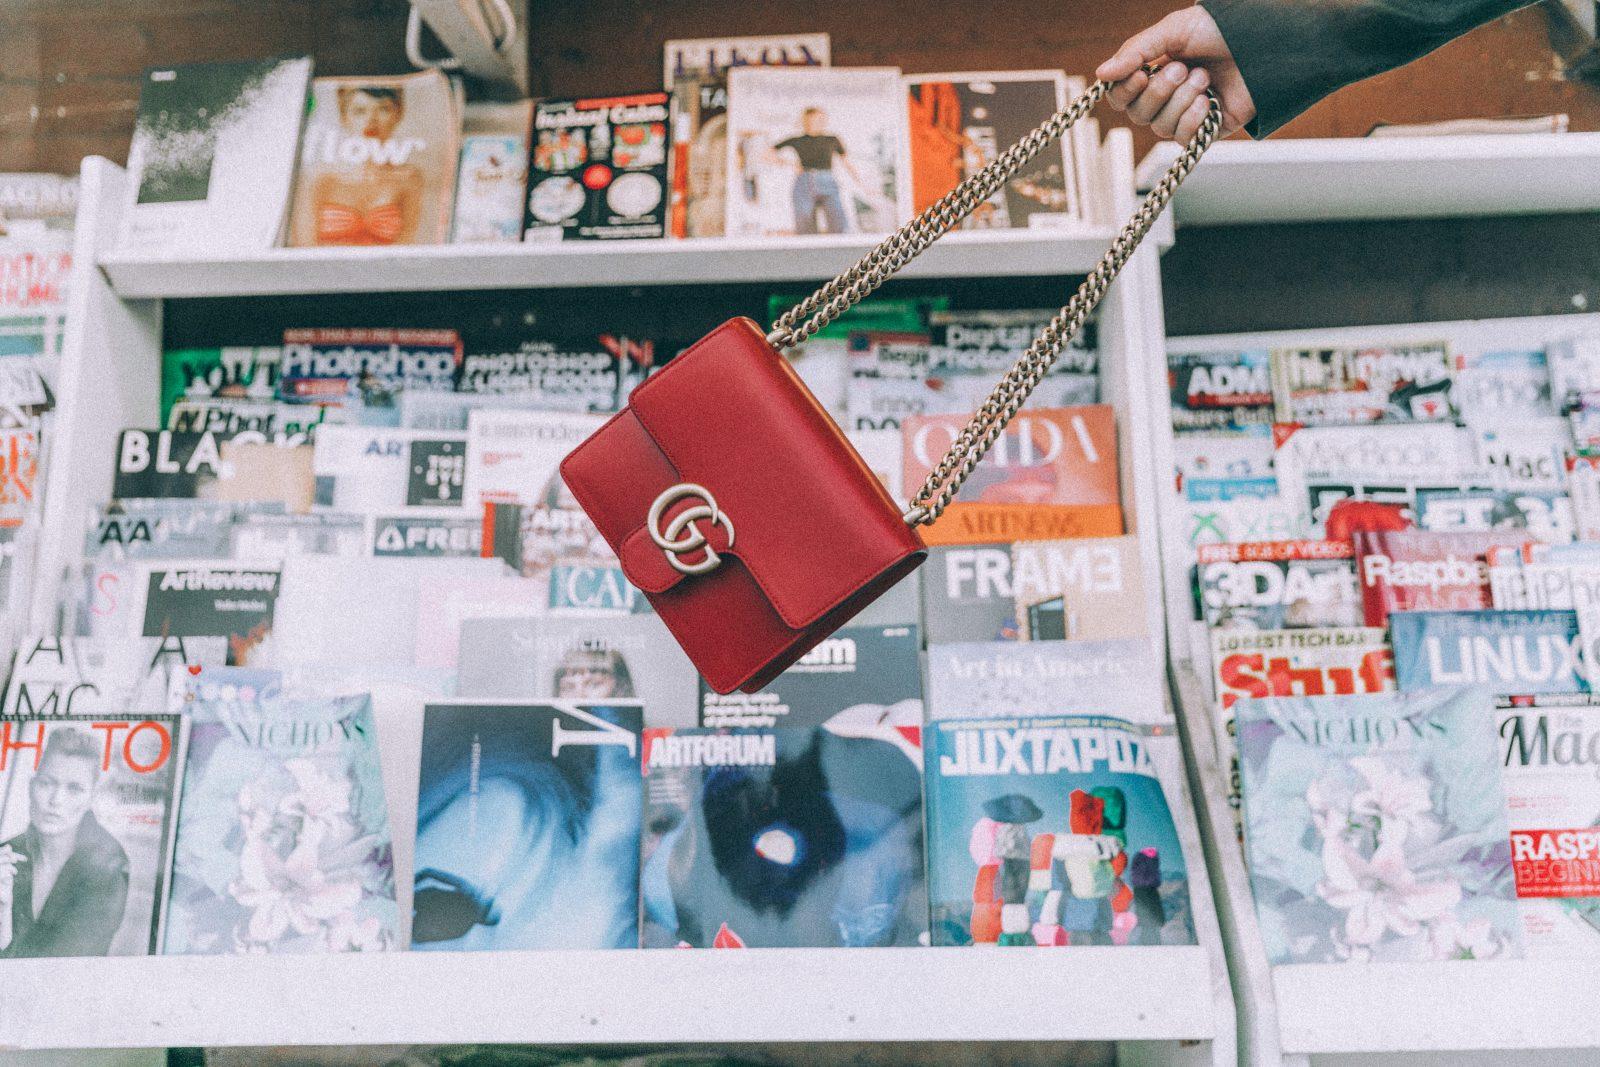 red_bag-snake_boots-gucci-levis-jeans-denim-iro_paris-black_blazer-los_angeles-la-fairfax-outfit-street_style-collage_vintage-117